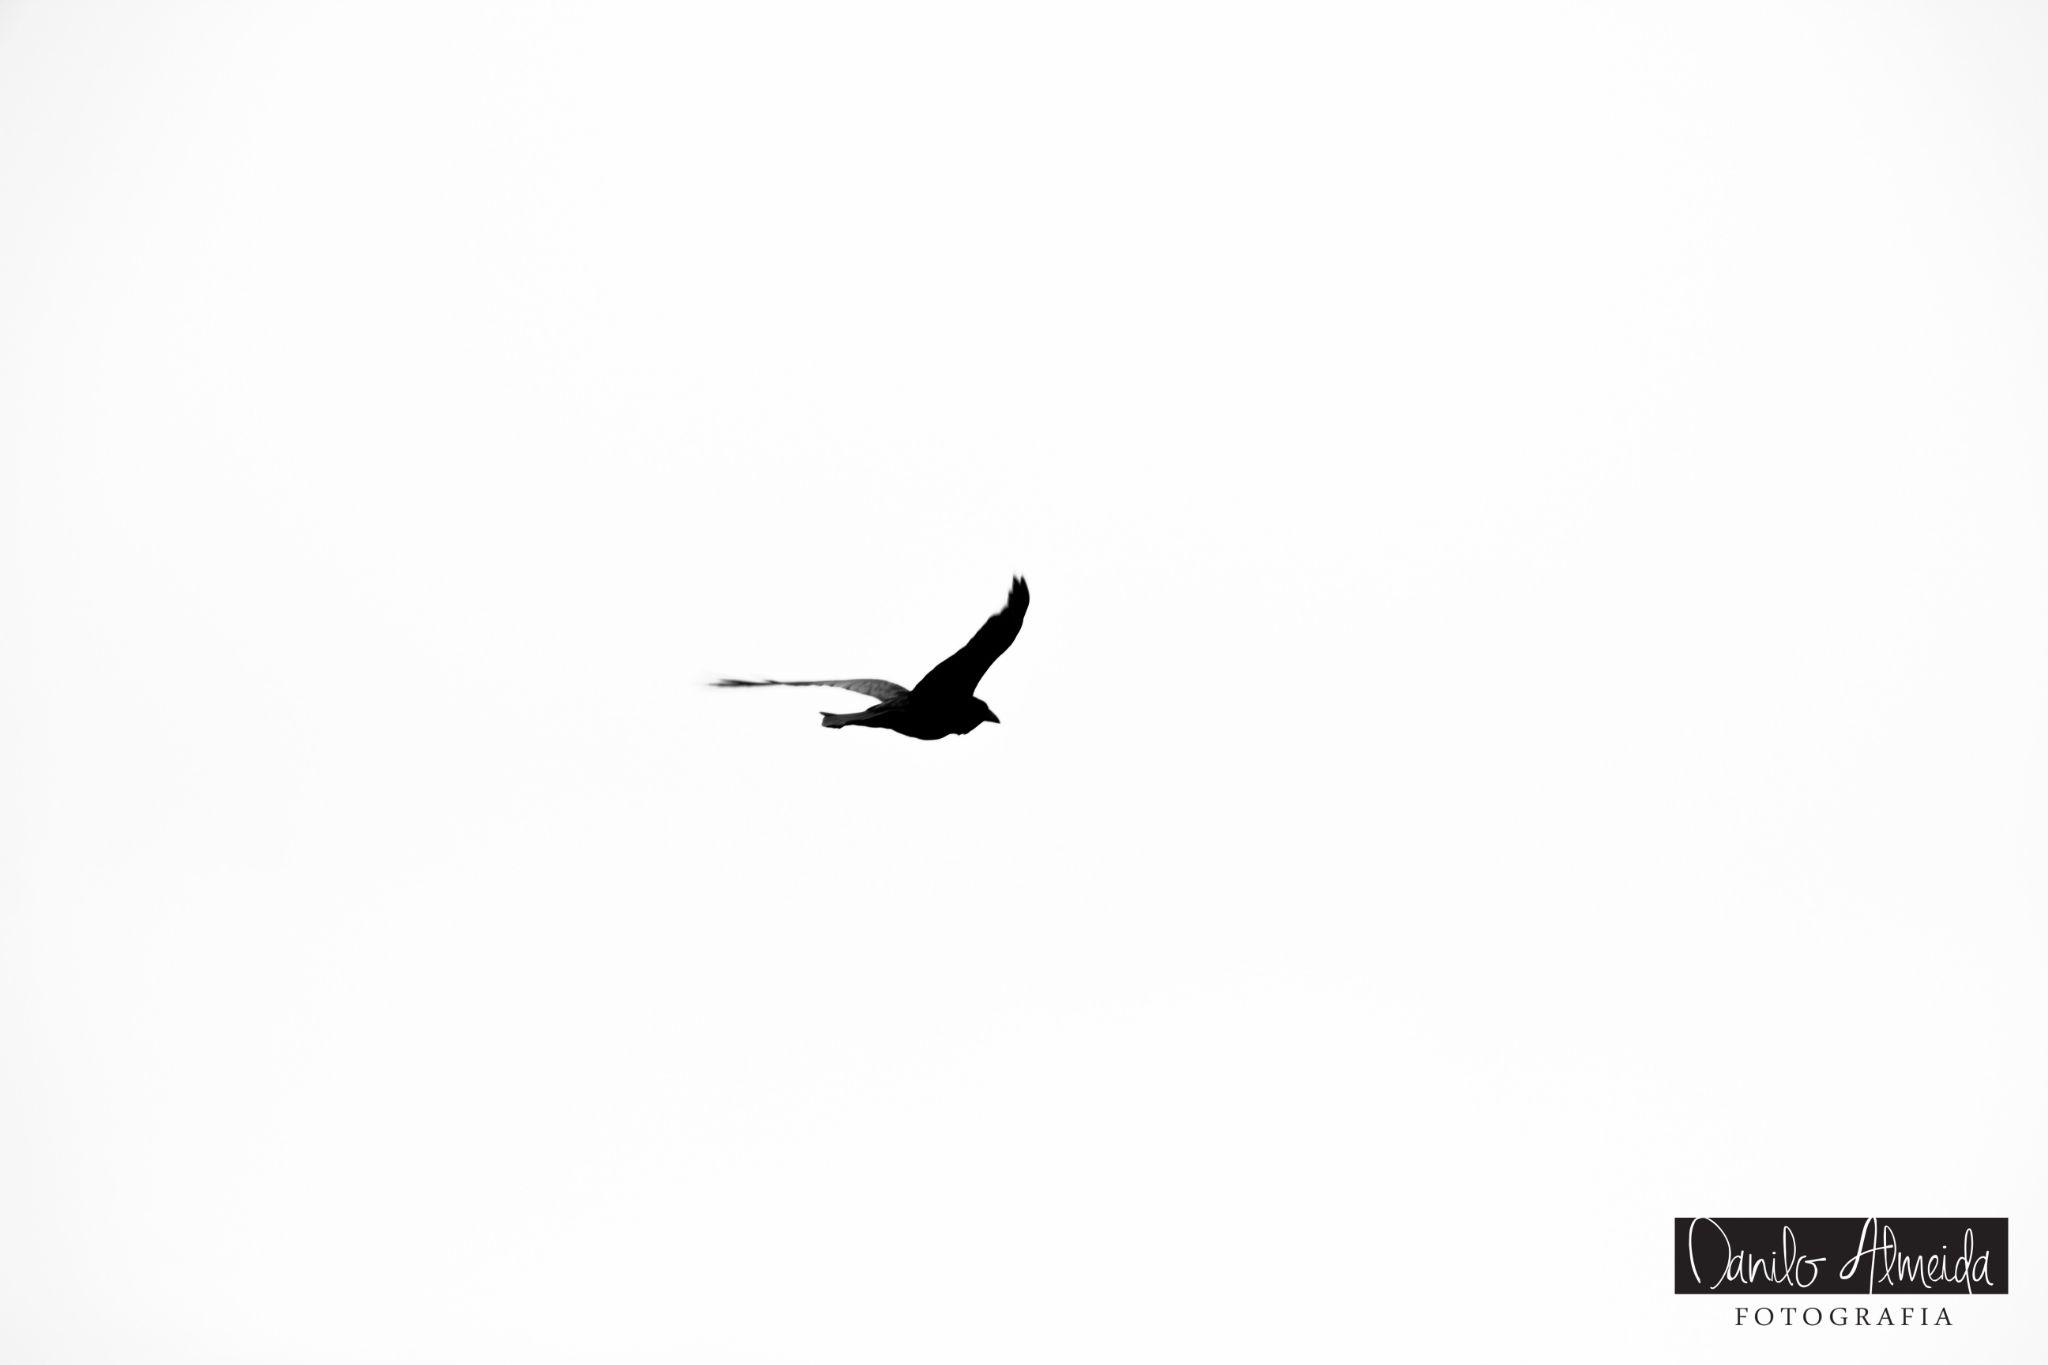 The Bird by Danilo Almeida